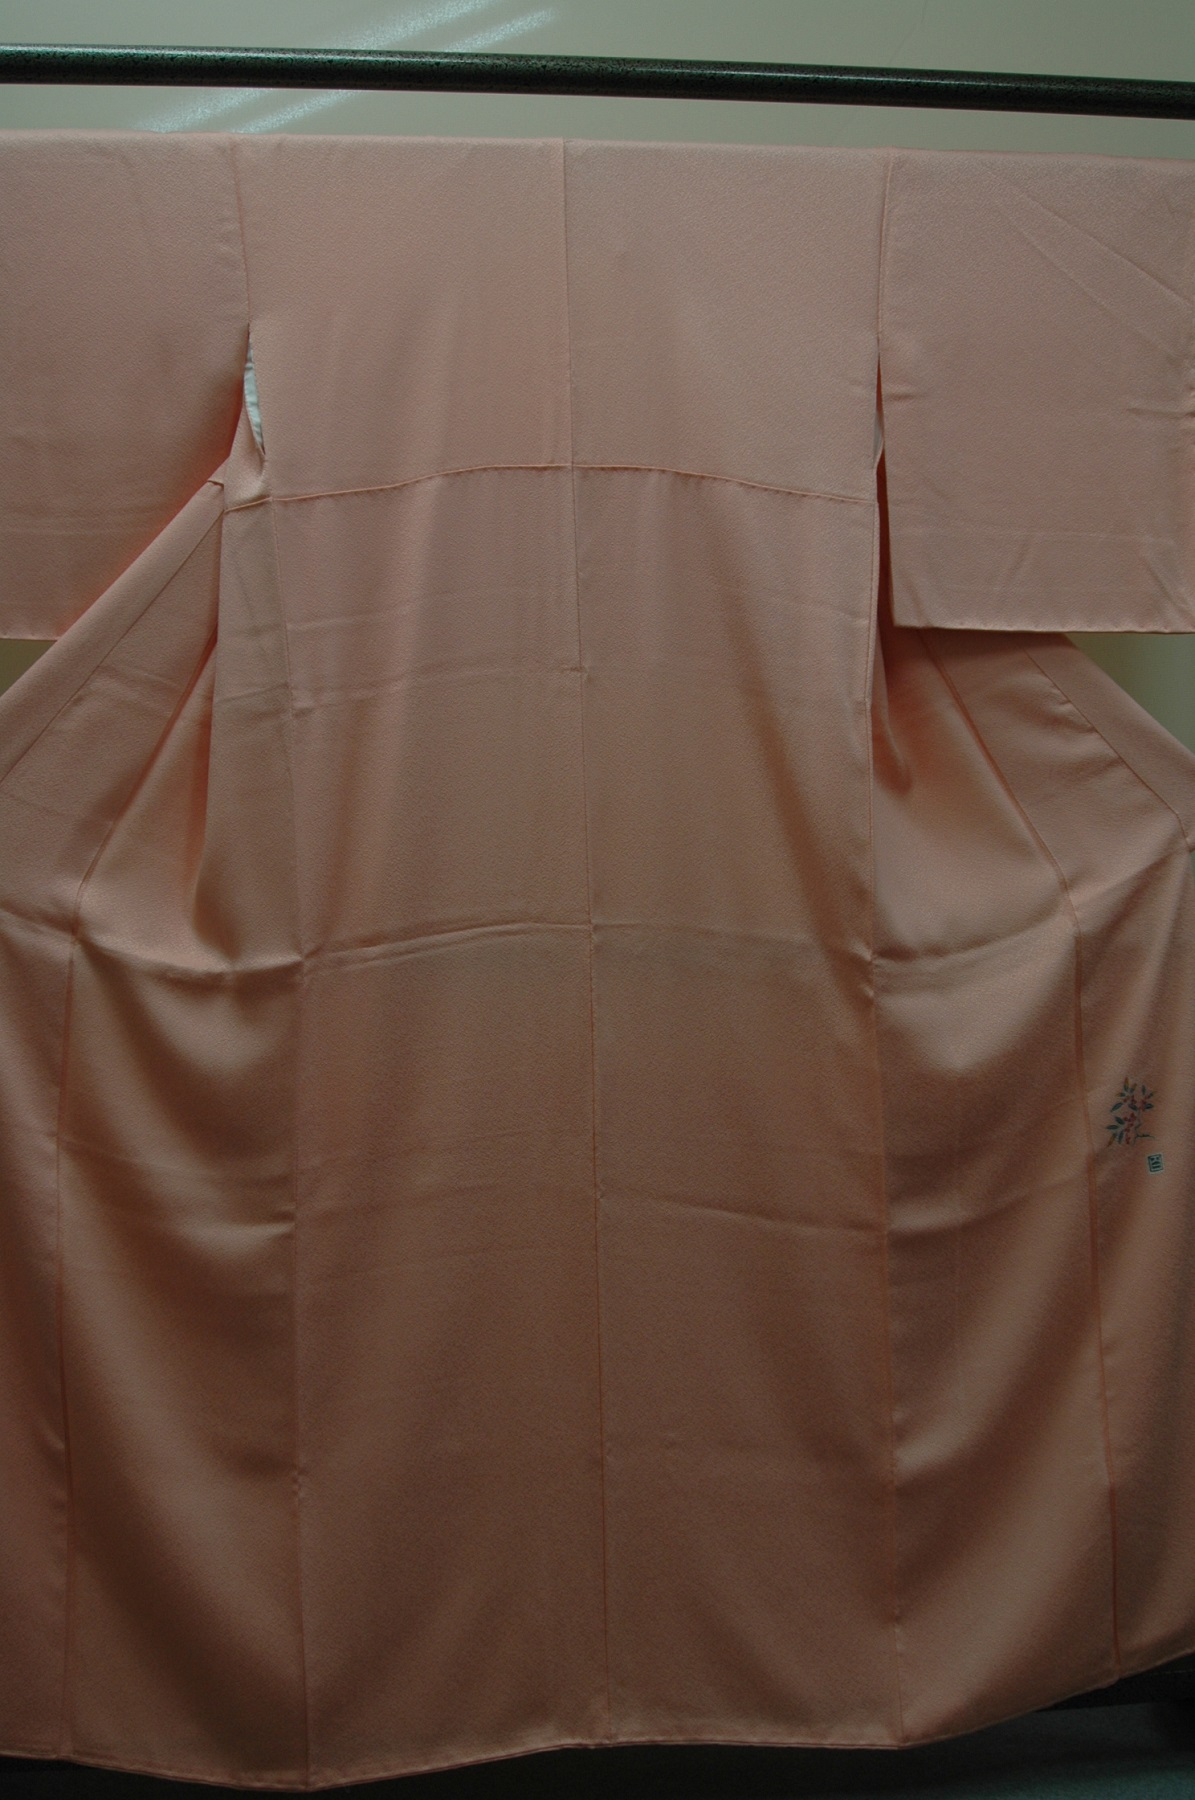 Monoki「モノキ」 【色無地 サーモンピンク 落款あり しつけ付 2110】 着物リメイク&リユース リサイクル